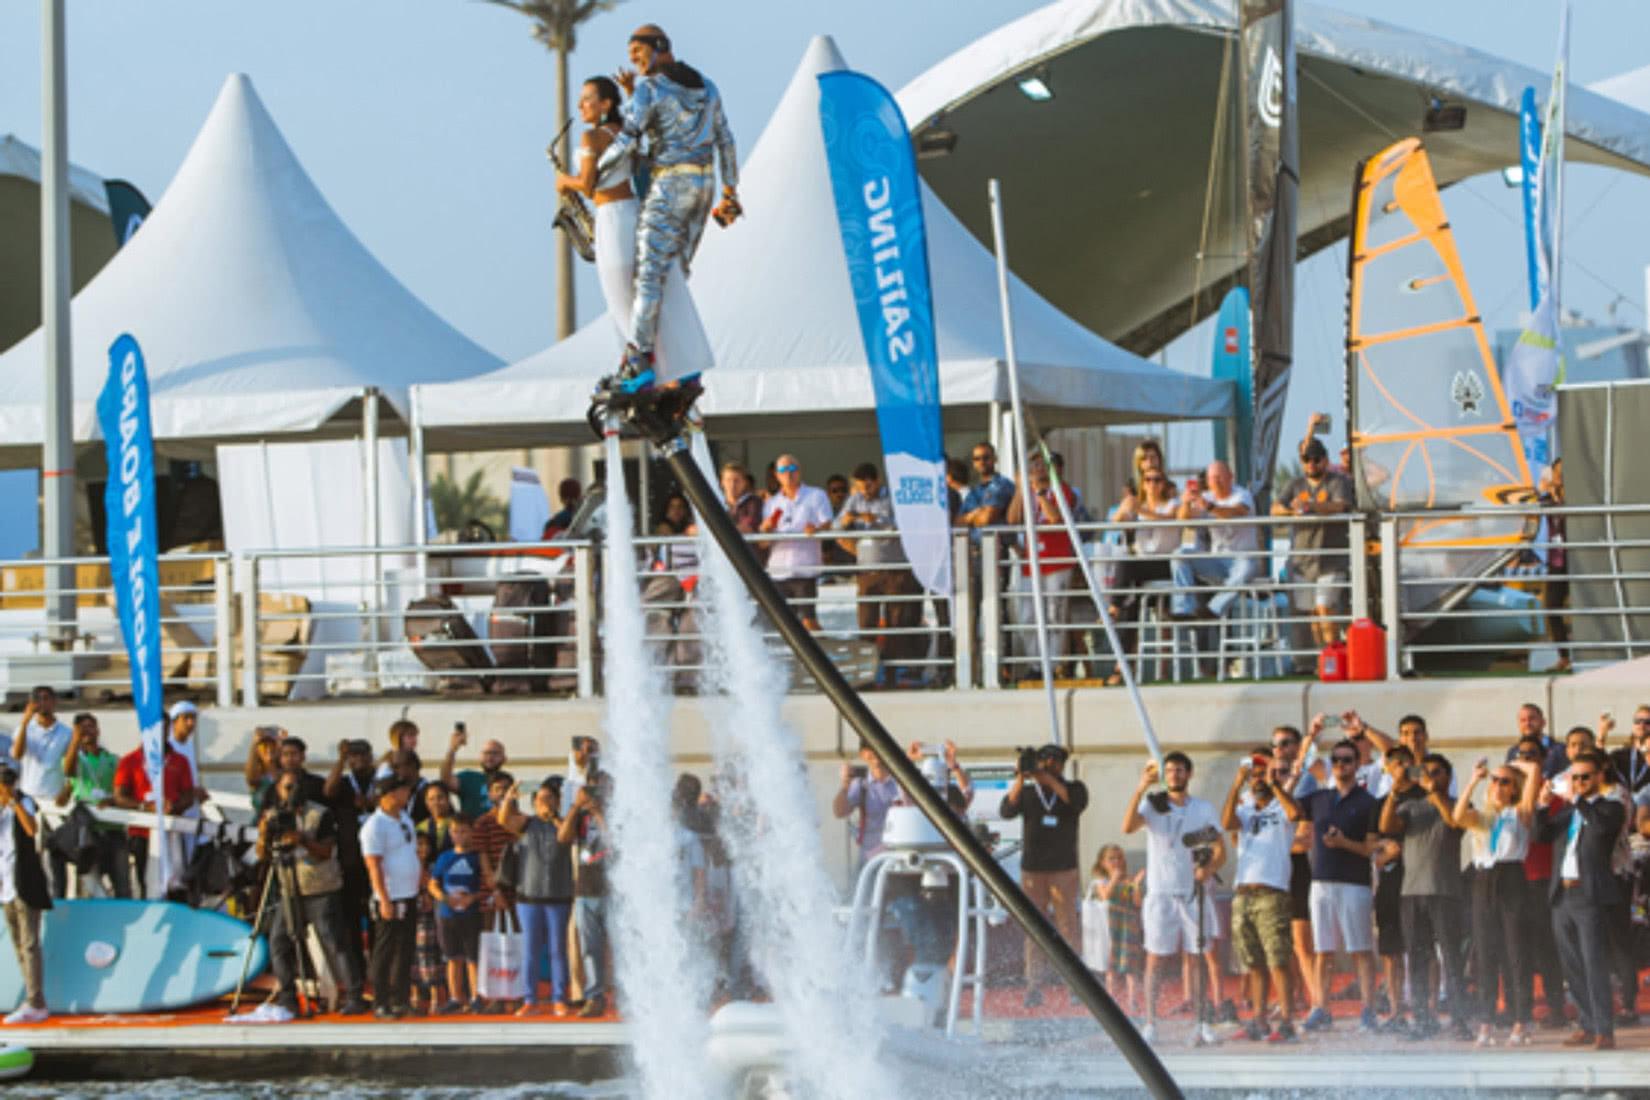 Abu Dhabi International Boat Show 2021 flyboarders - Luxe Digital